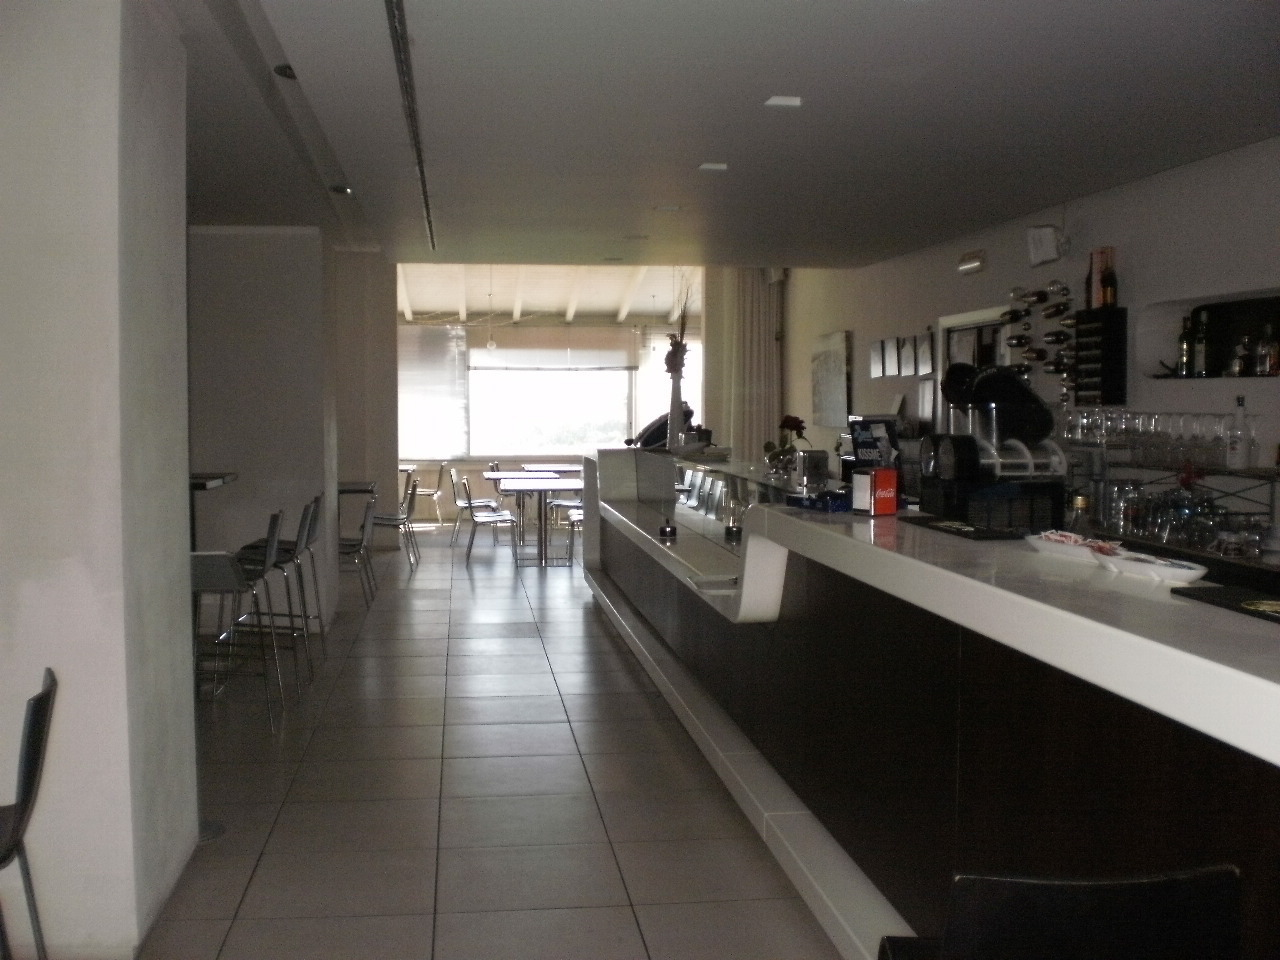 Bar Ristorante a Ragusa Rif. 4166051